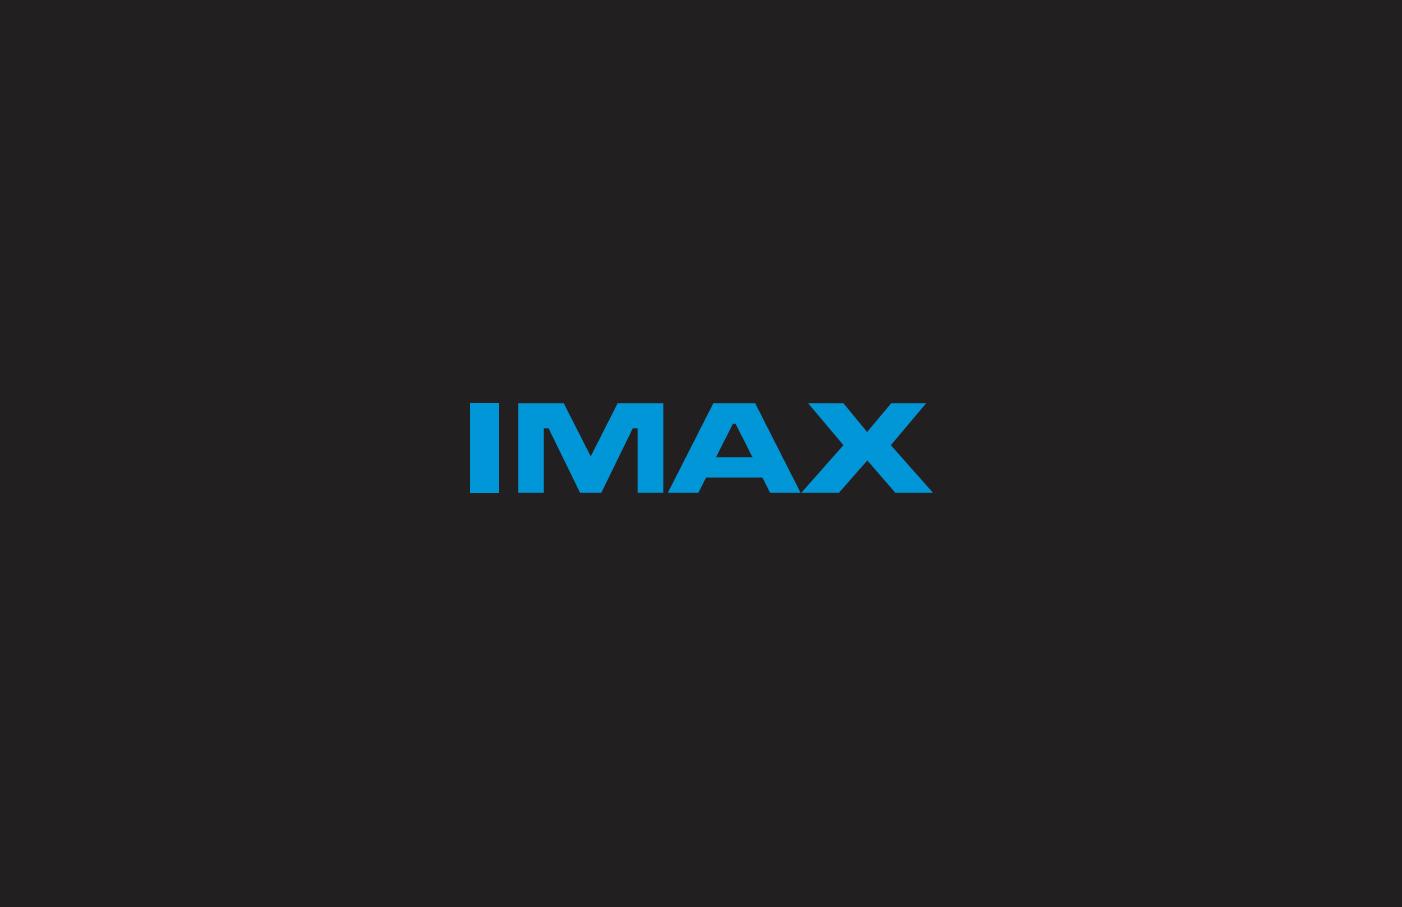 John_IMAX_01.jpg